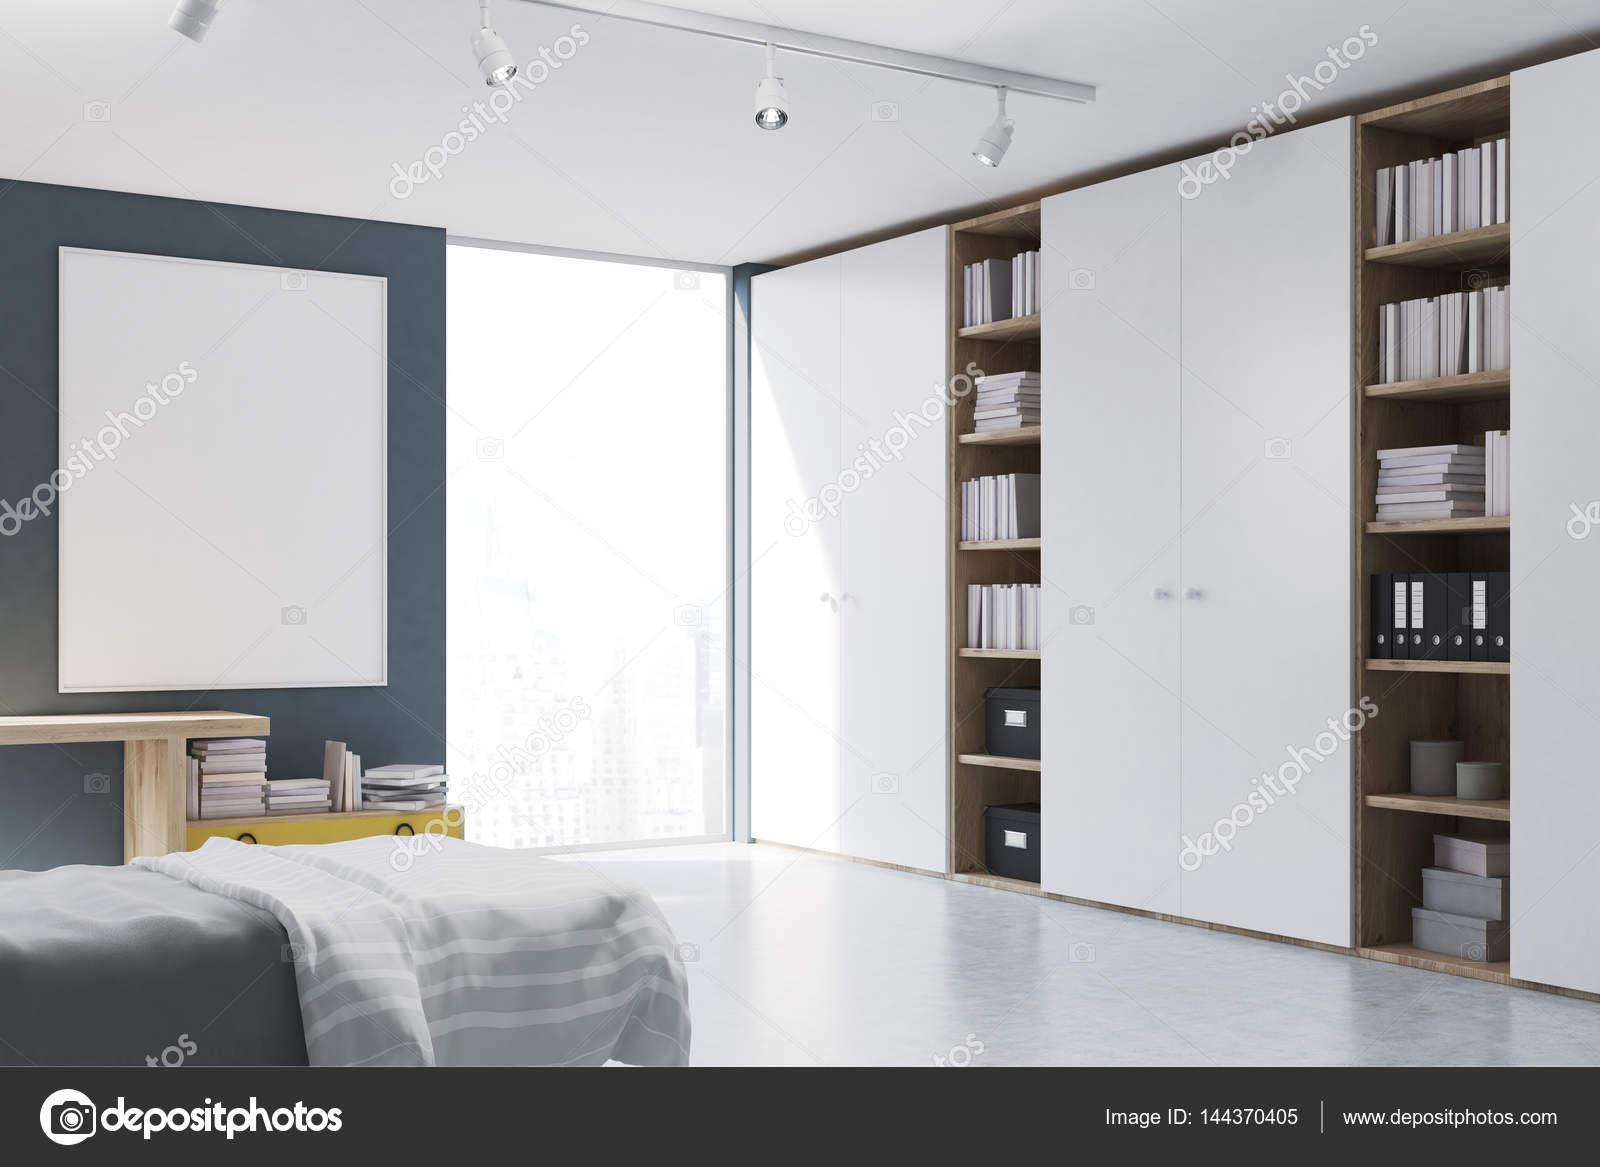 https://st3.depositphotos.com/2673929/14437/i/1600/depositphotos_144370405-stock-photo-gray-walled-bedroom-with-bookcase.jpg